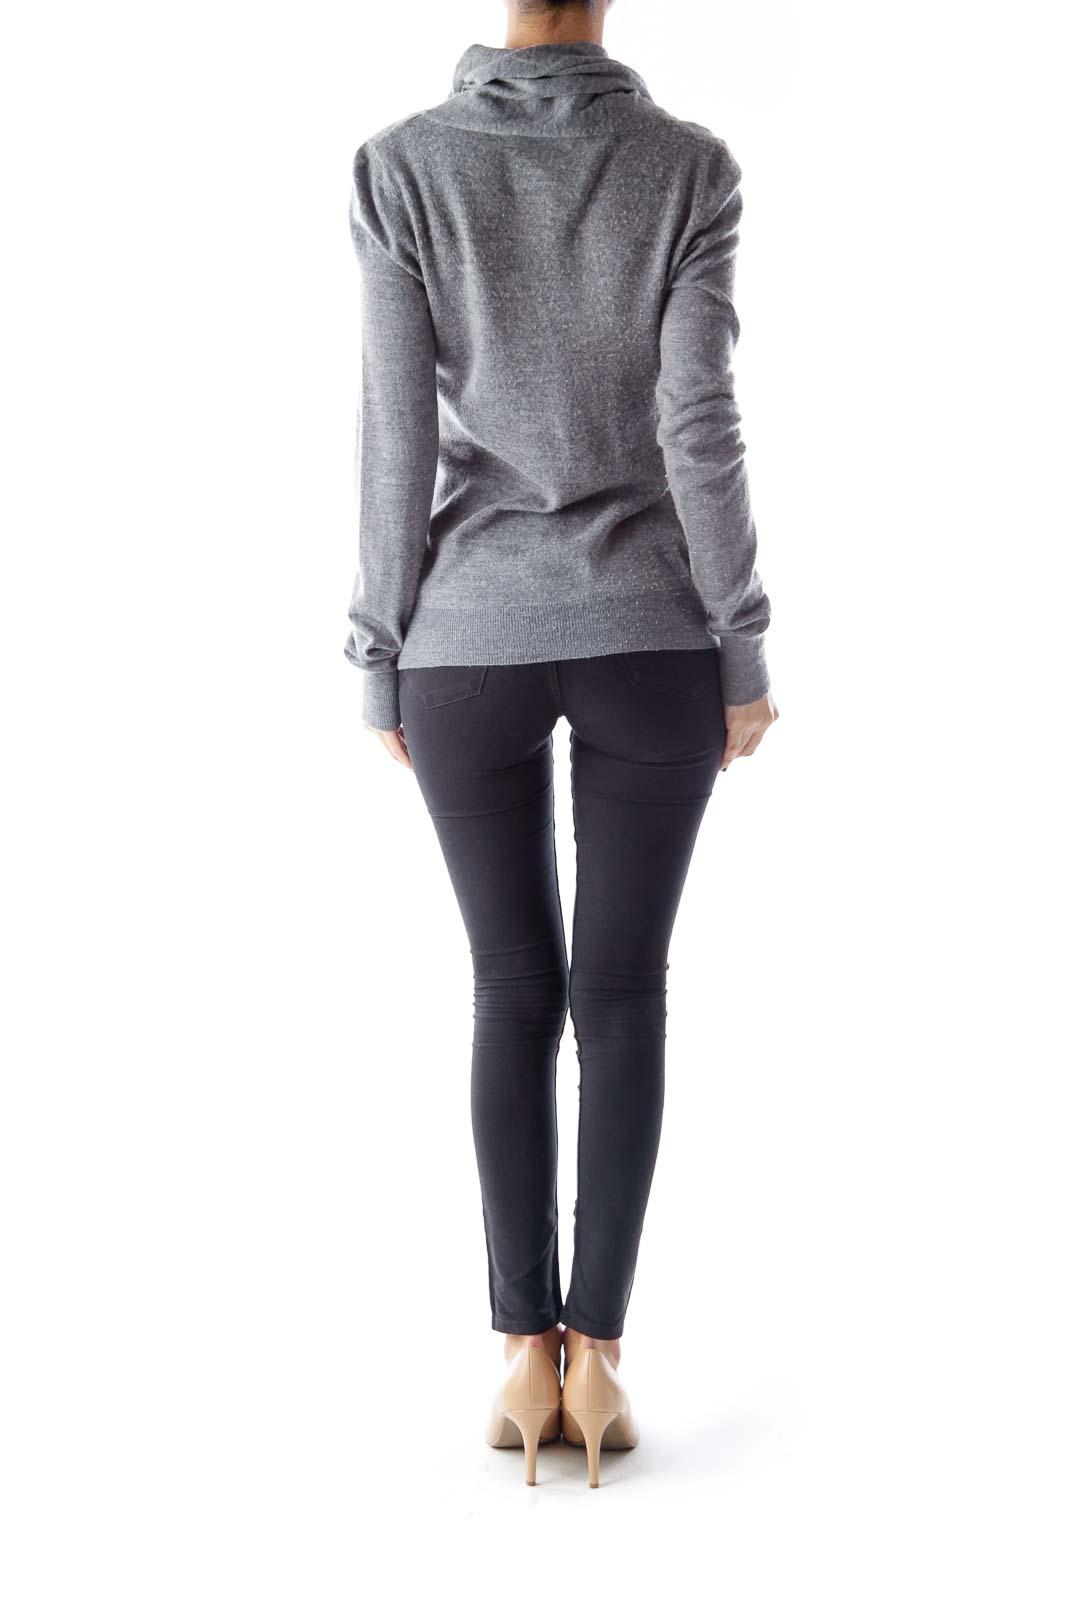 Gray Cowl-Neck Sweater [S] - SilkRoll